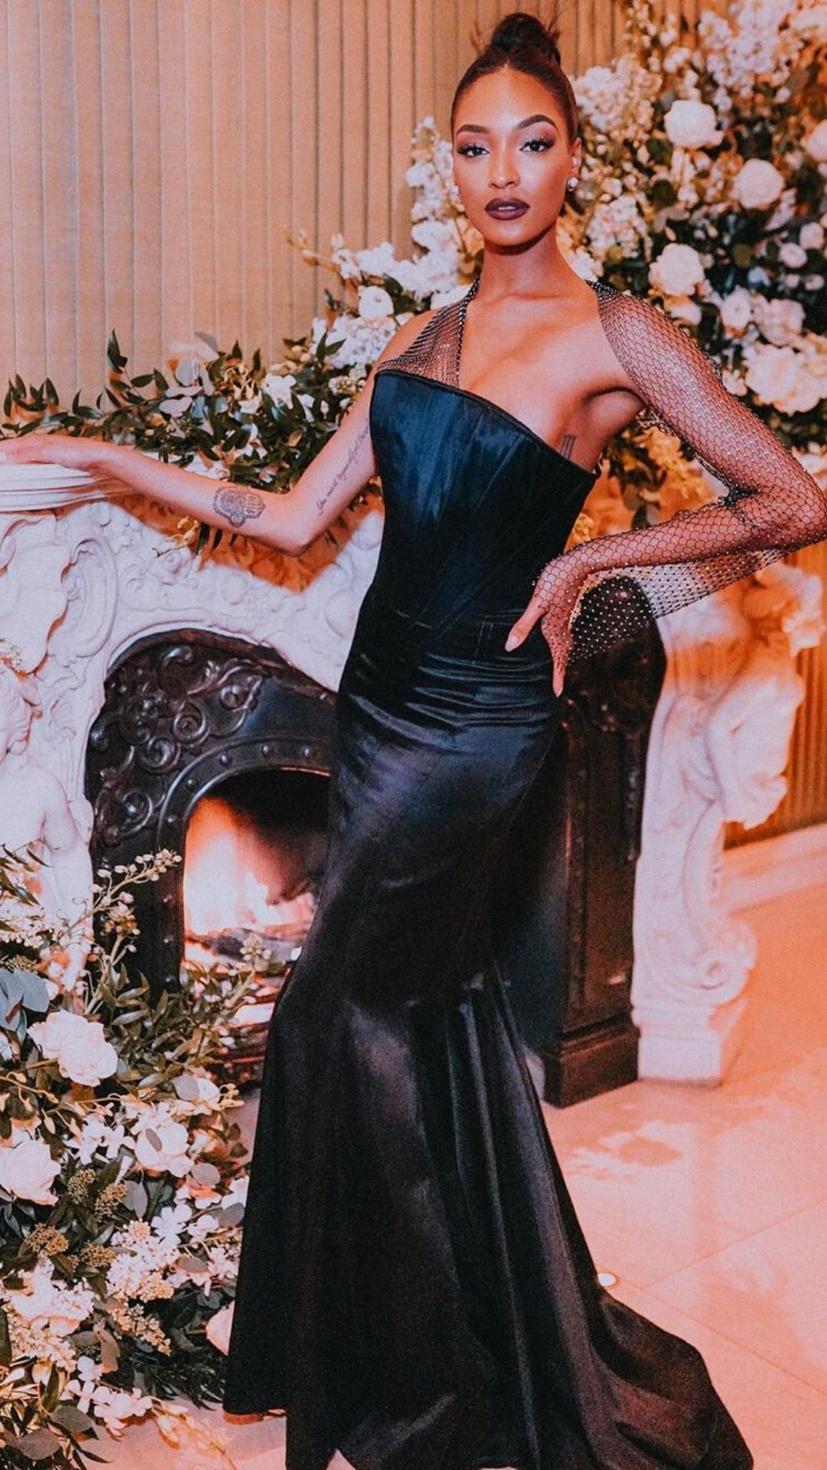 Jourdan Dunn wears a Jean Paul Gaultier Spring 1967 couture gown